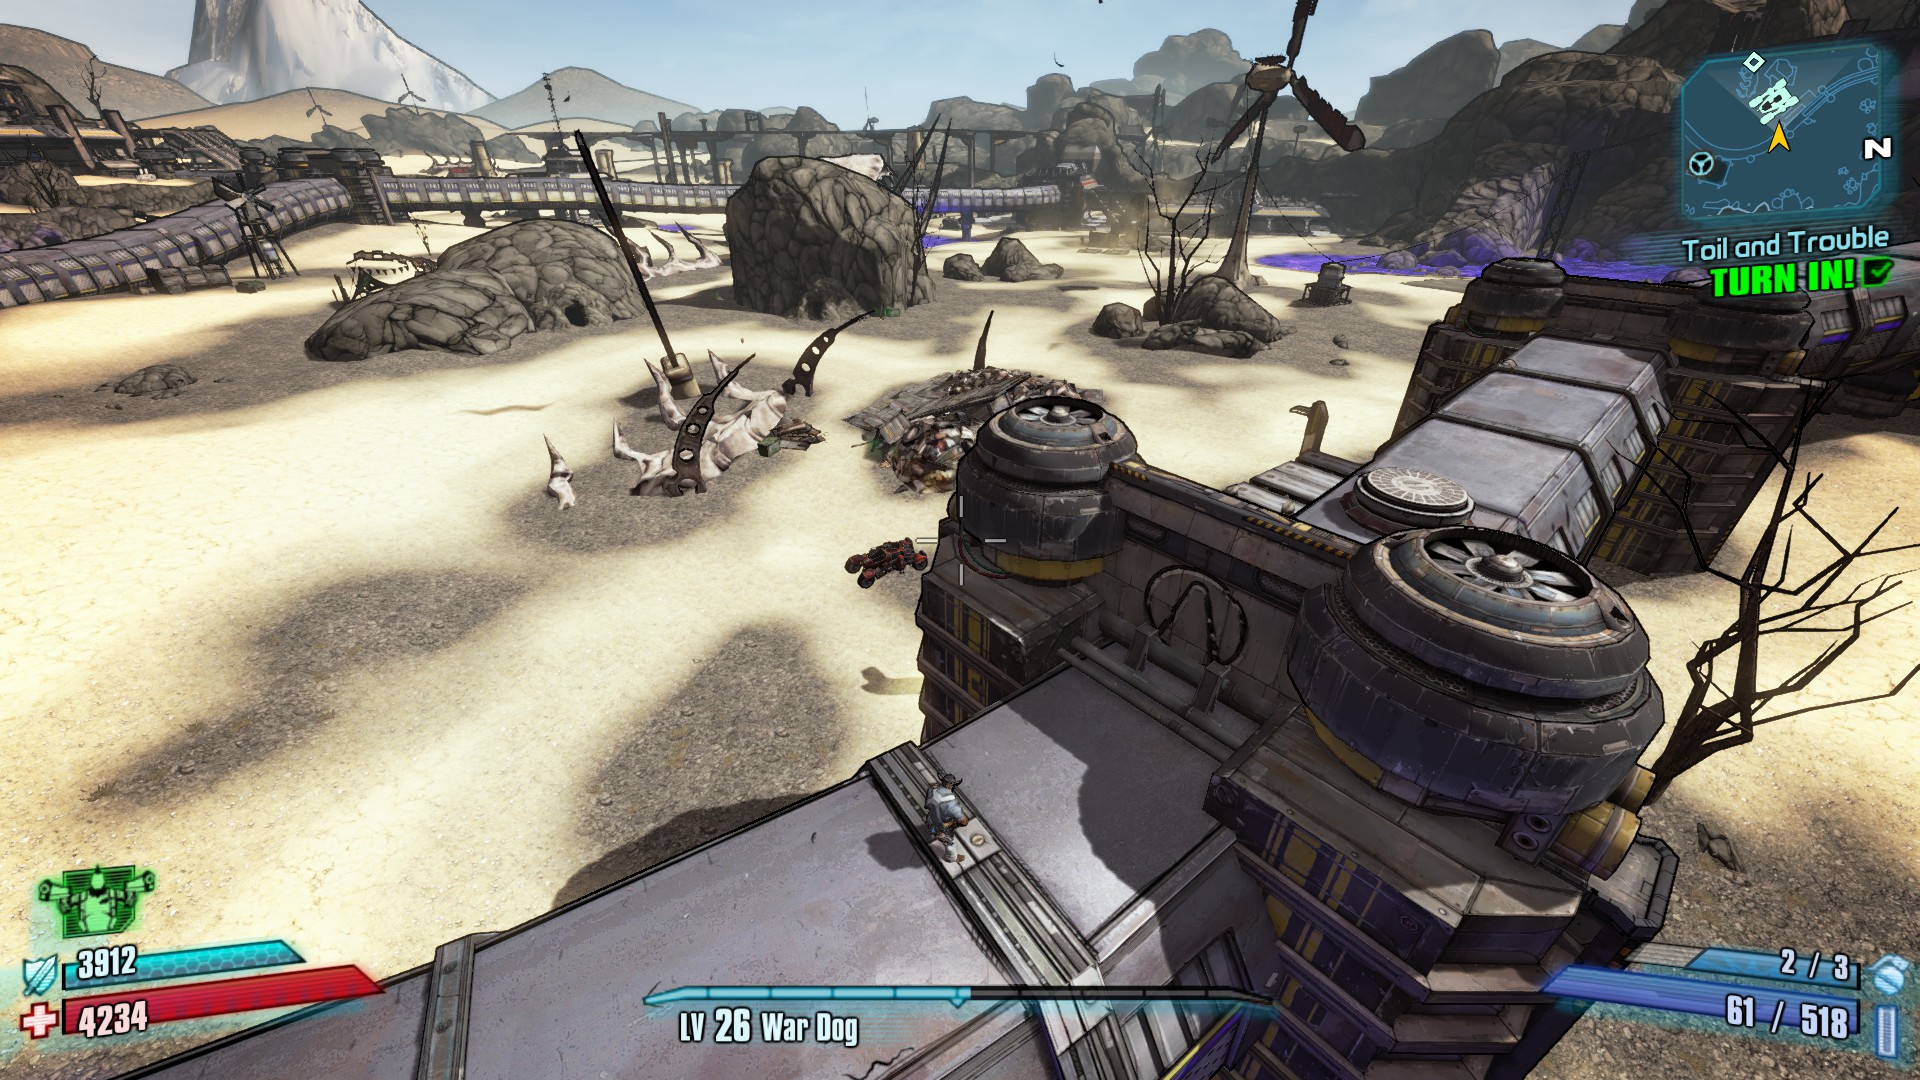 Steam Community :: Guide :: [99 9 % COMPLETE]Borderlands 2